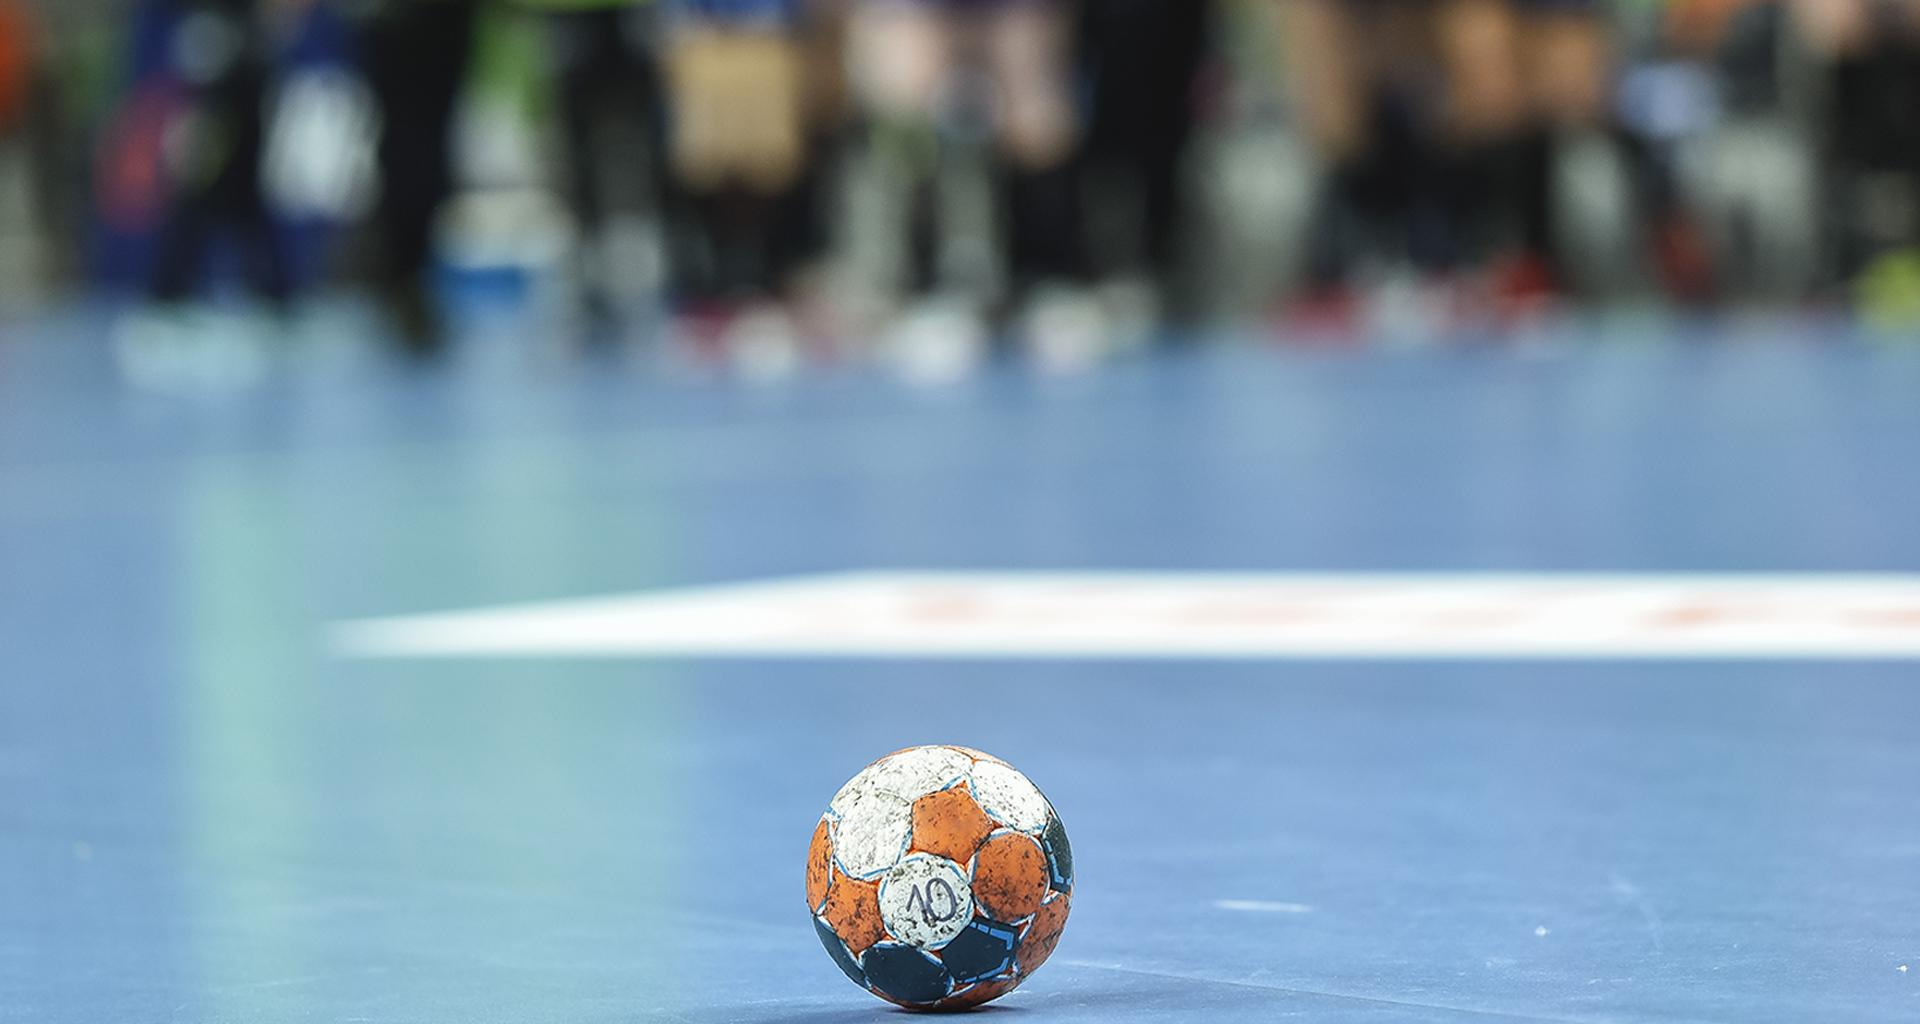 Handball ball lying on the blue parquet .